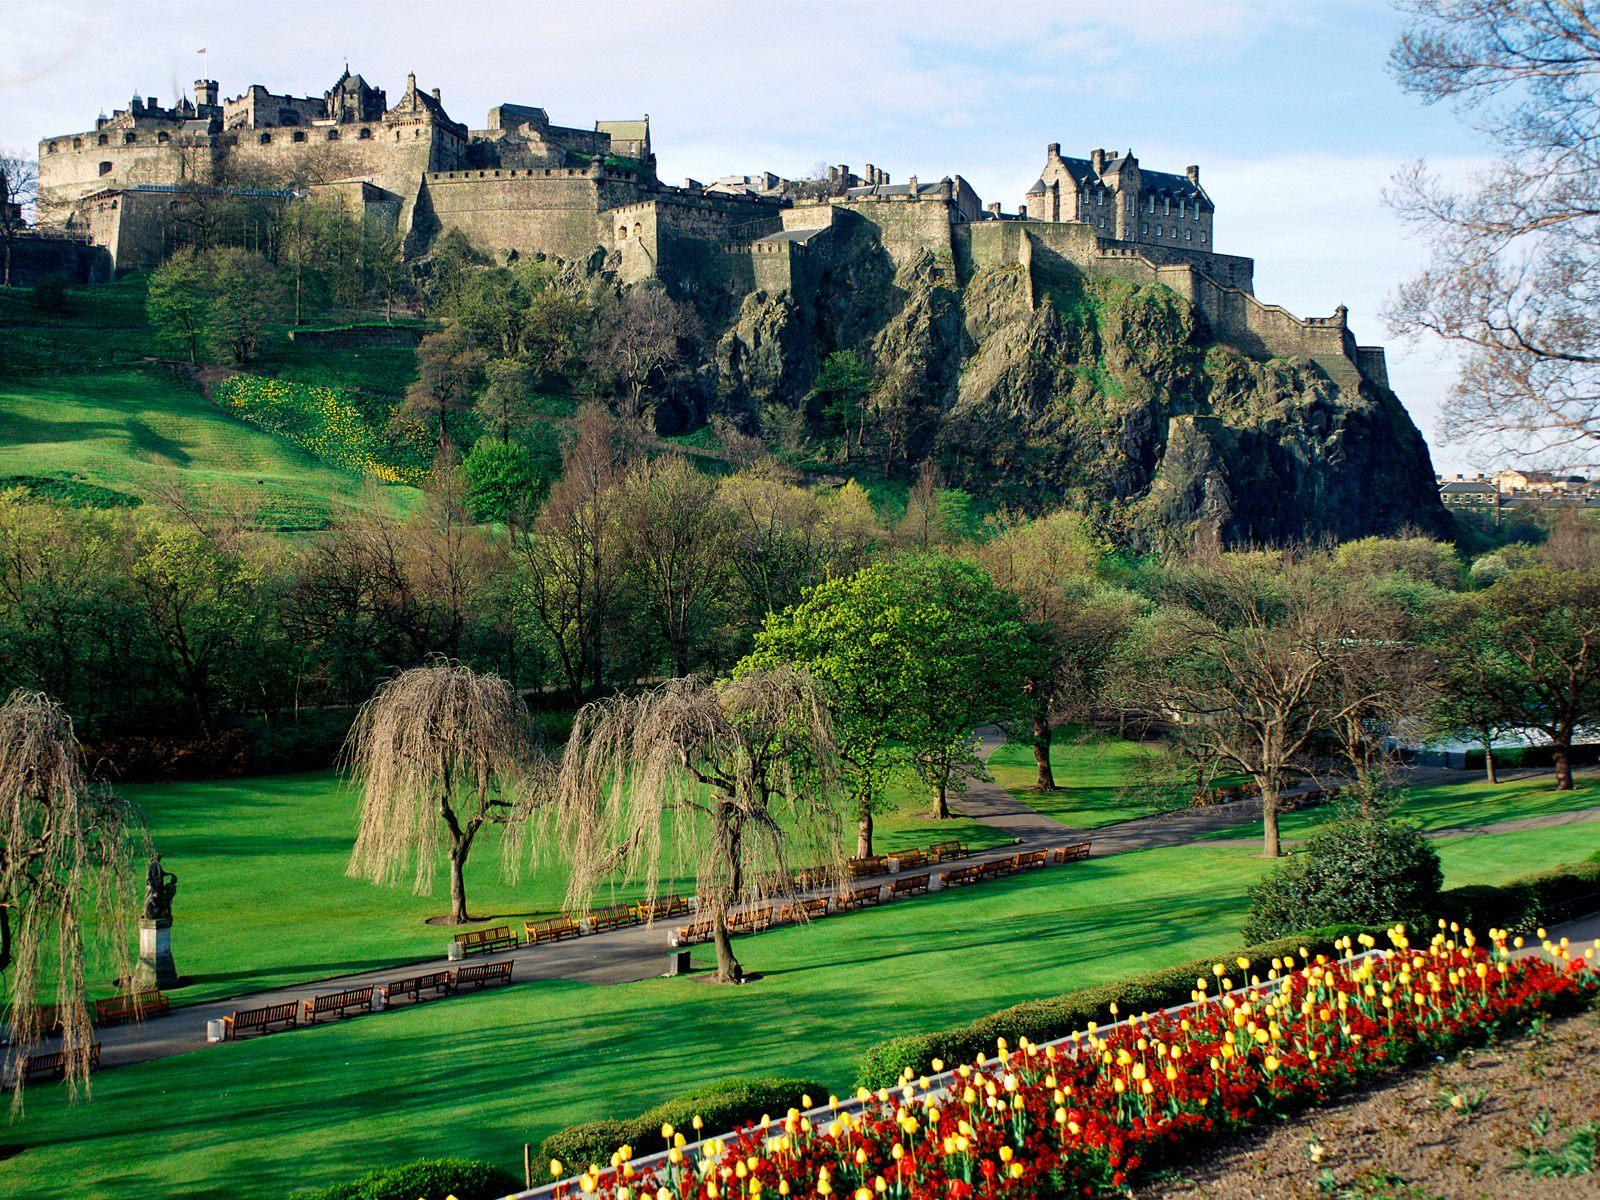 http://4.bp.blogspot.com/-Fj0XIdXuVWE/TwLx_viRajI/AAAAAAAABB4/O_vOZDvp5BE/s1600/scotland-wallpaper-11-786583.jpg